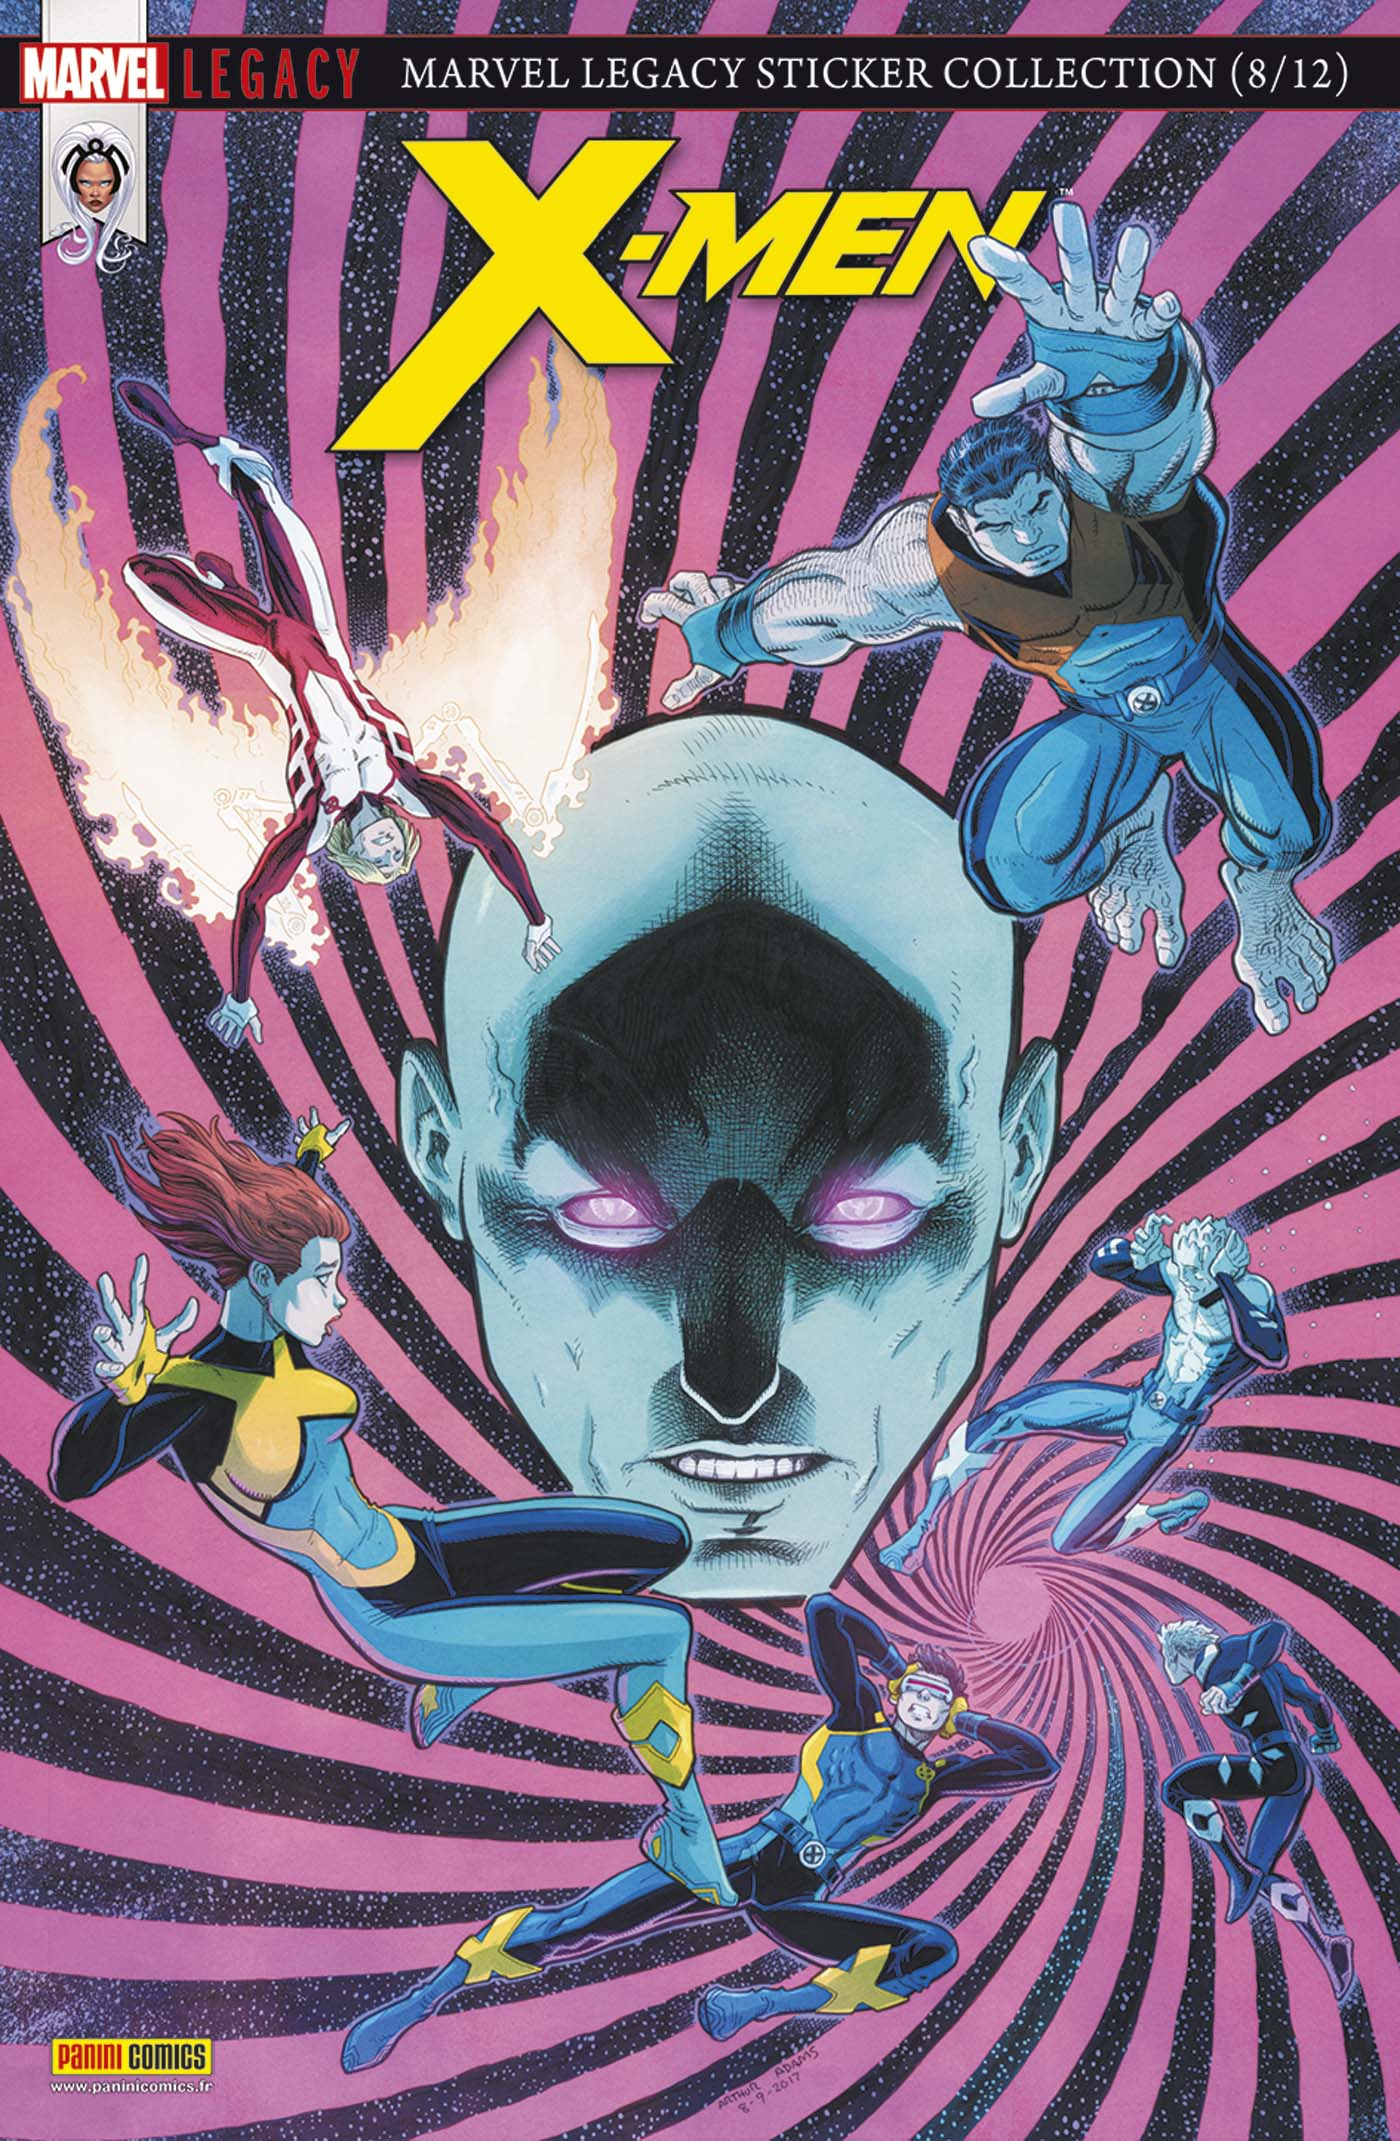 Marvel Legacy X-Men n°2 (VF)